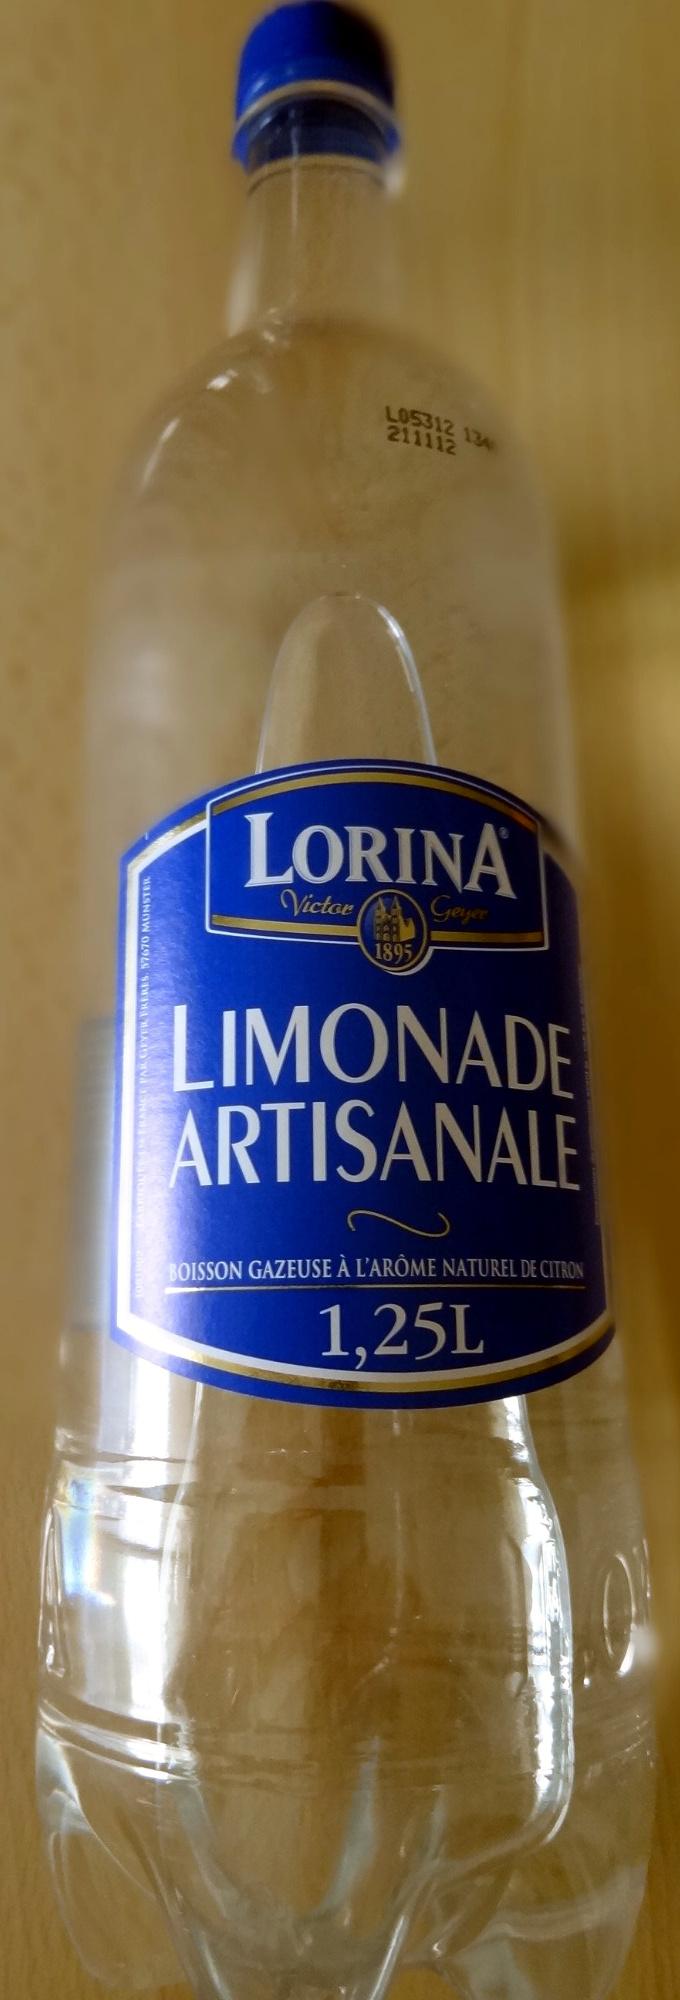 Limonade artisanale - Product - fr